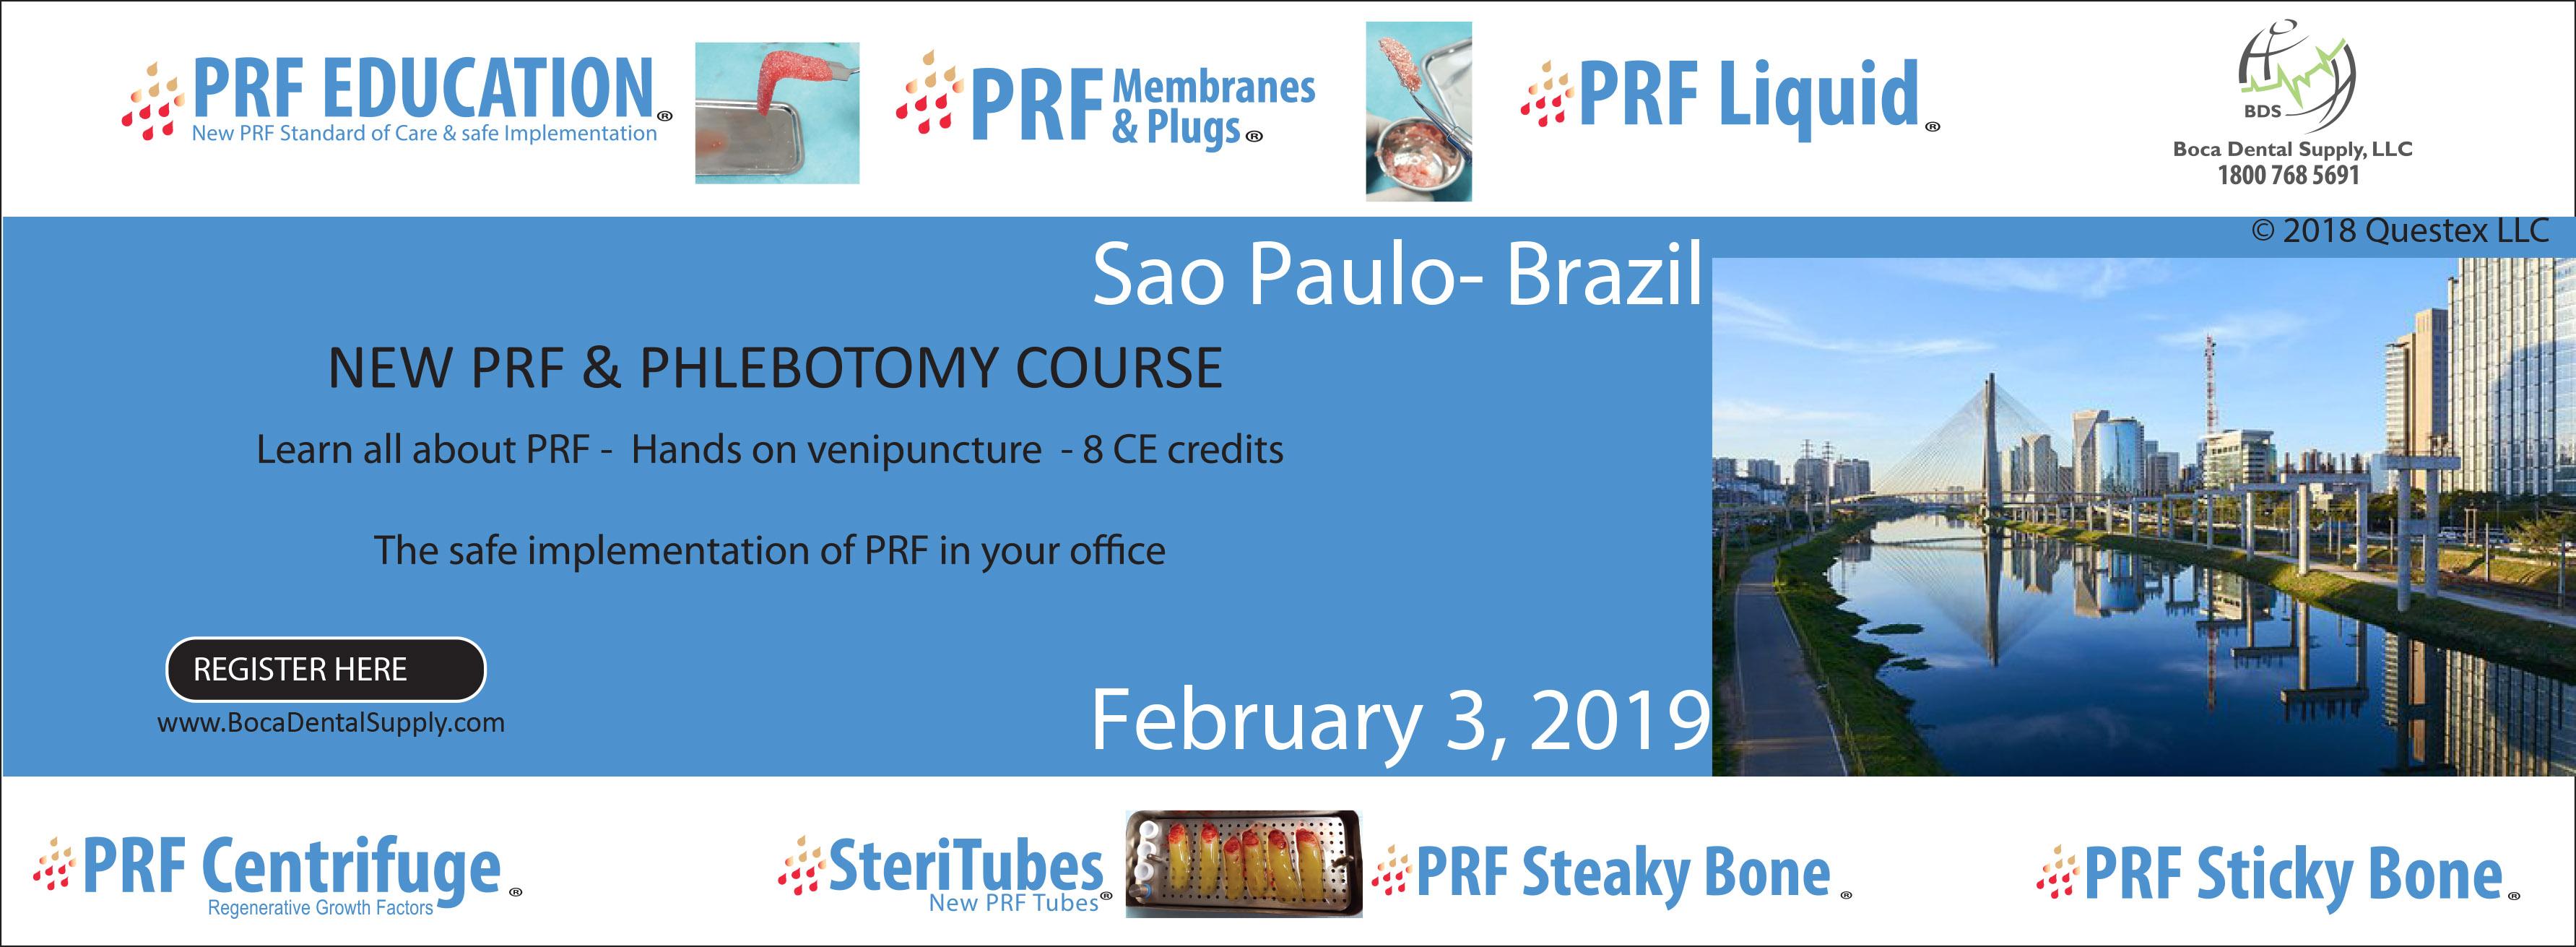 prf-course-sao-paulo-2019-2.jpg